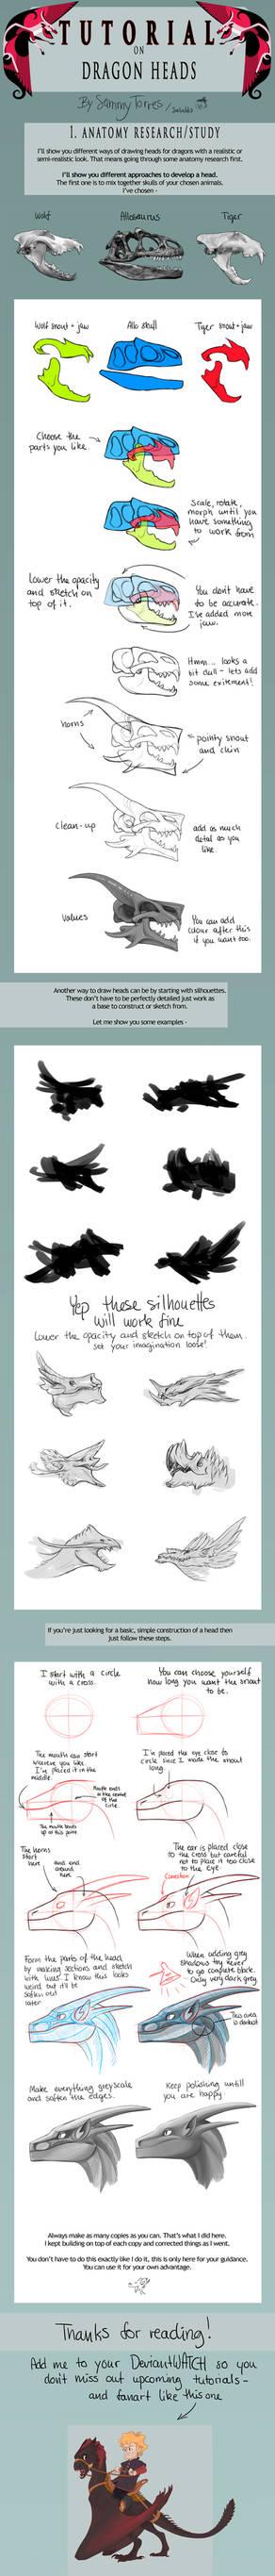 TUTORIAL: Dragon Heads